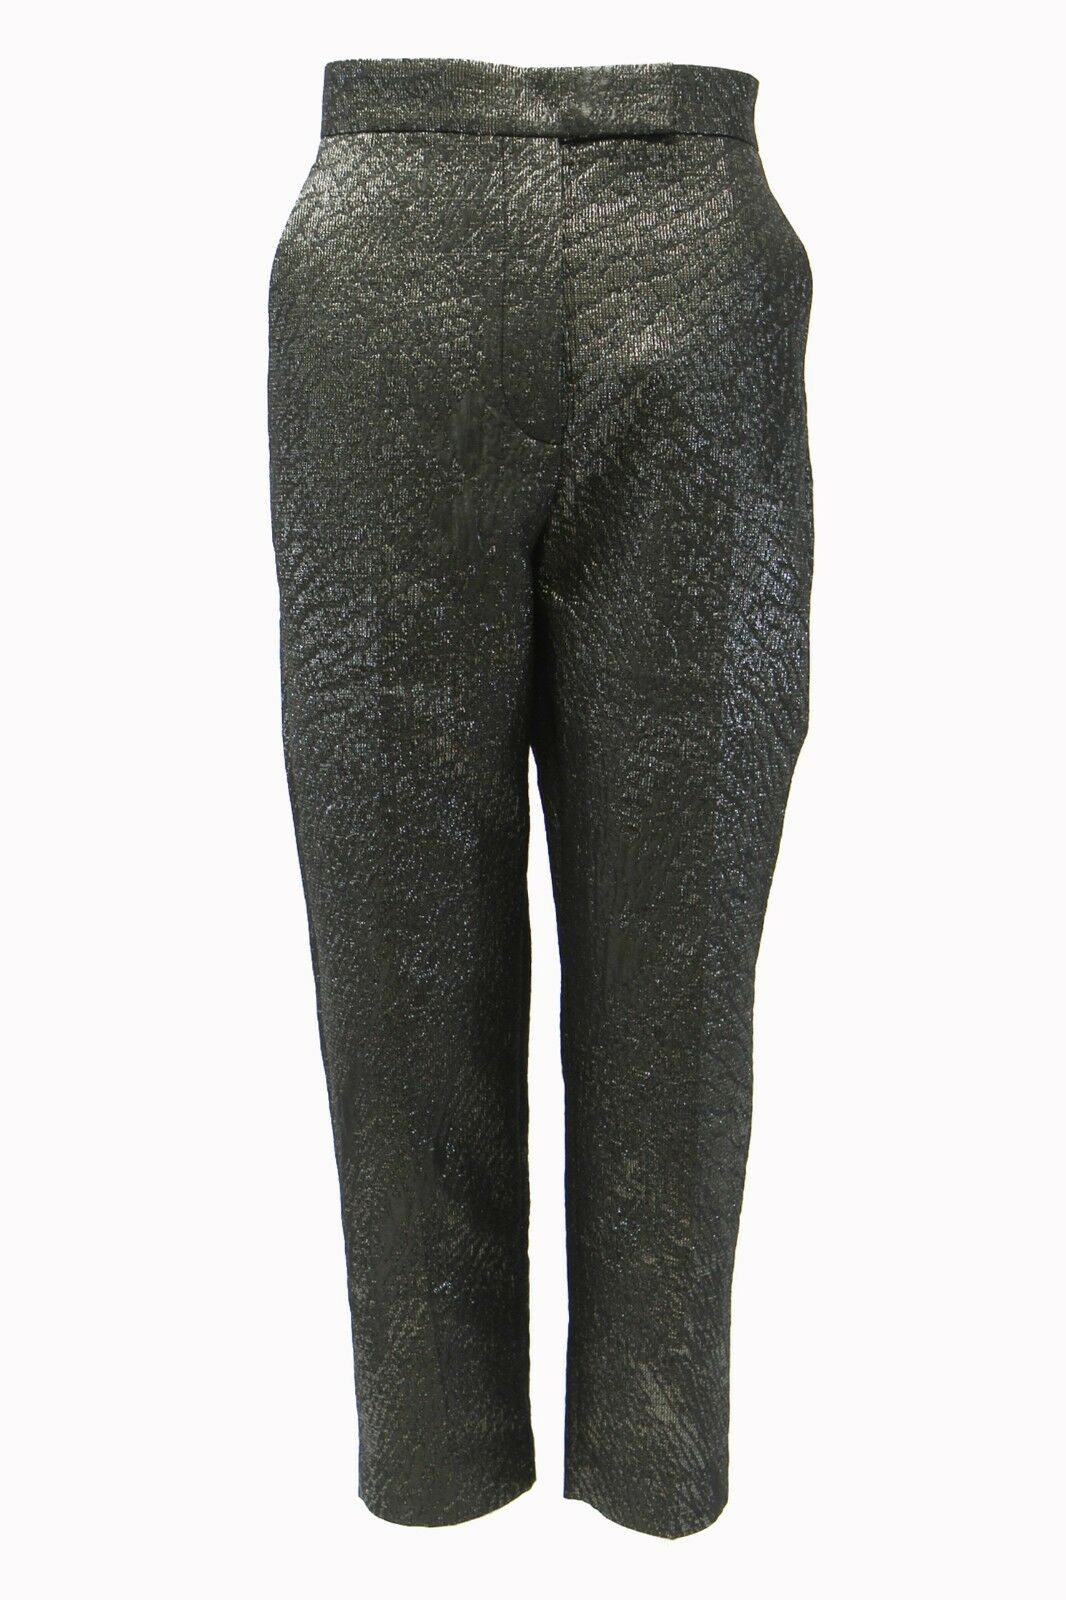 NWT 1195 Brunello Cucinelli Embroiderot Silber Lurex Brocade Dress Pant42 6 A181